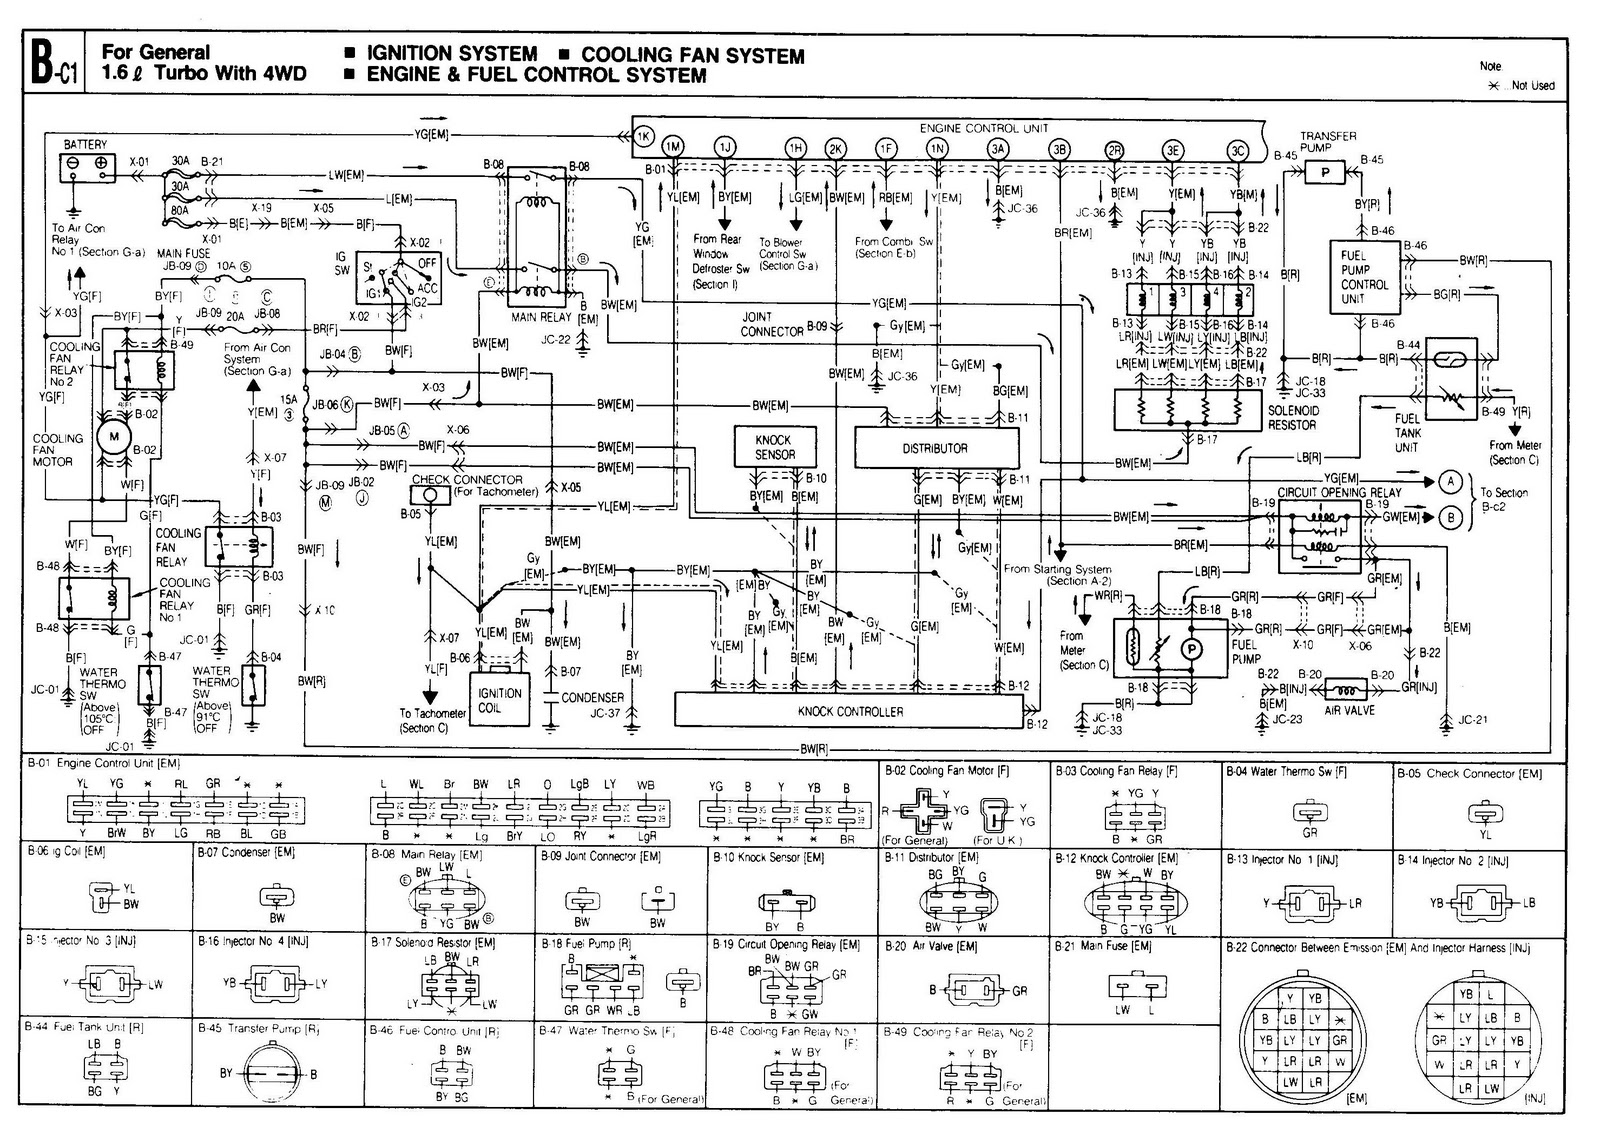 Nissan Caravan E24 Wiring Diagram S10 Radio Extraordinary 1981 Bmw 633csi Ideas Best Image Mazda B6t Engine System Diagrampy